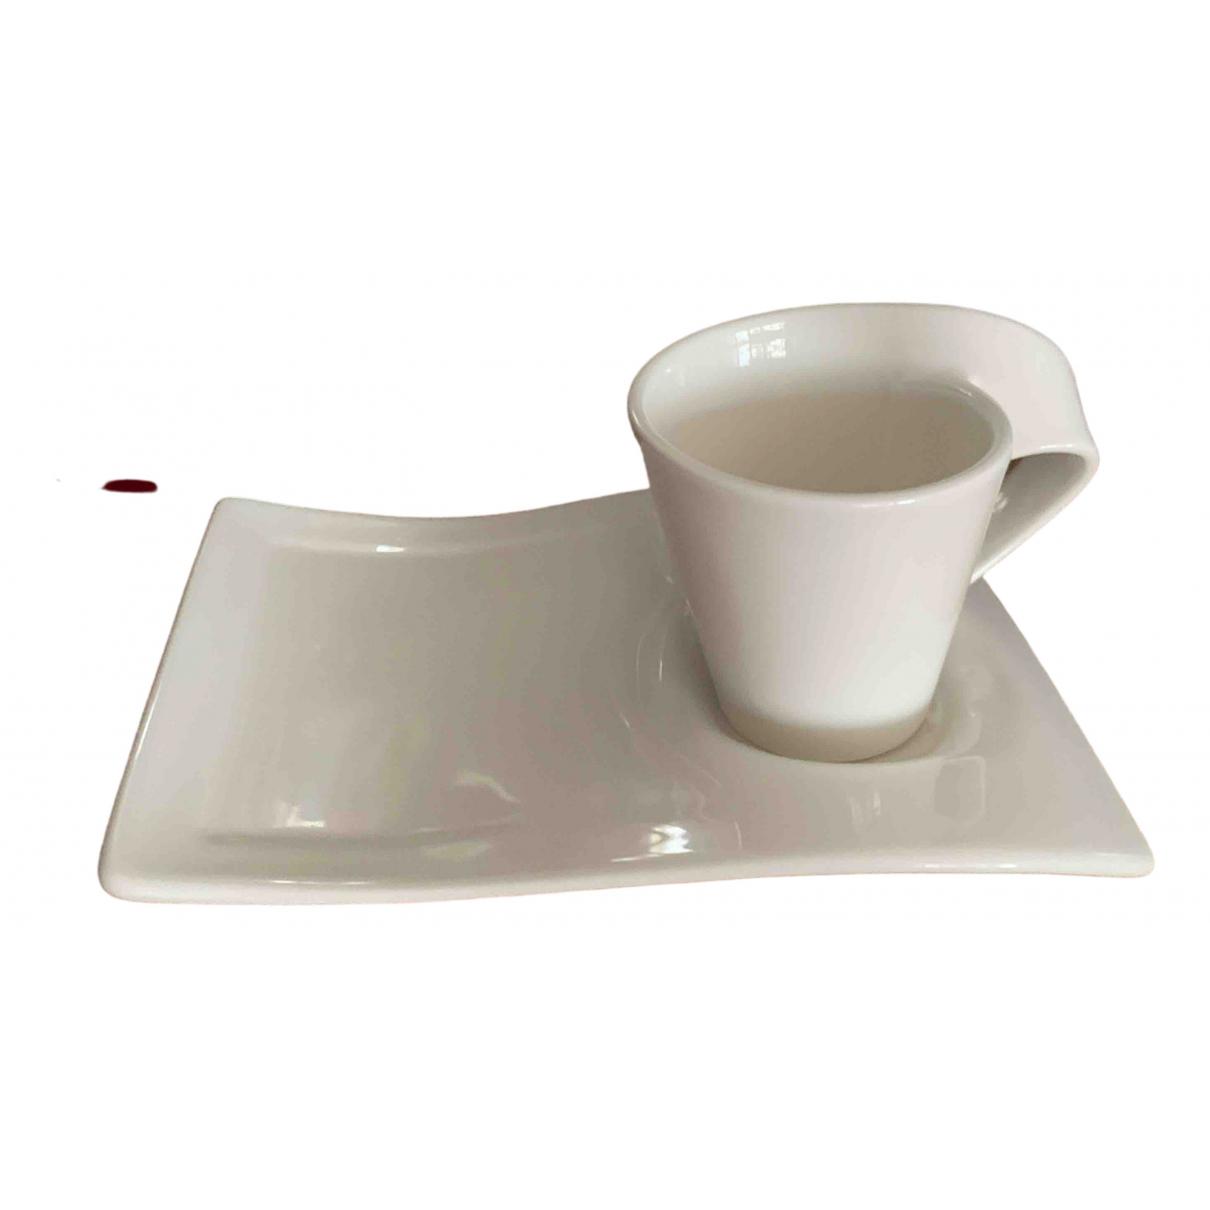 Juego de te/cafe de Ceramica Non Signe / Unsigned